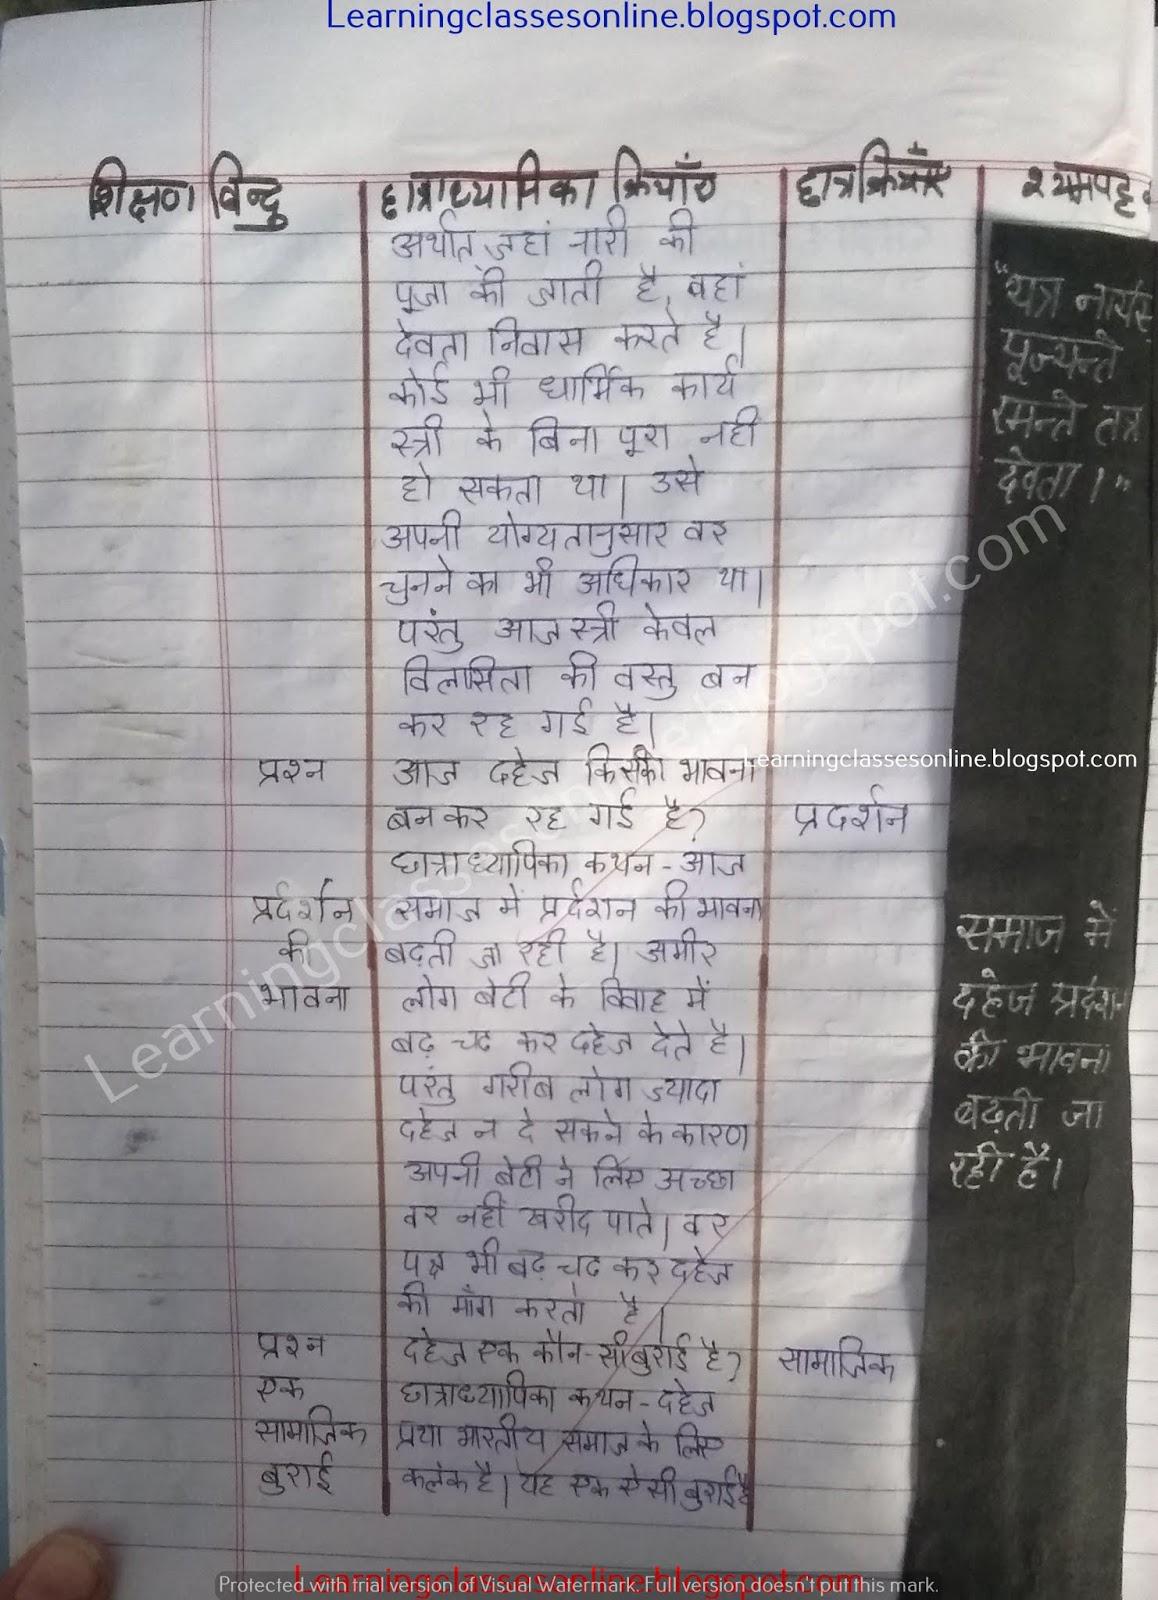 Hindi lesson plan pdf free download for bed, ded,btc, nios, ignou